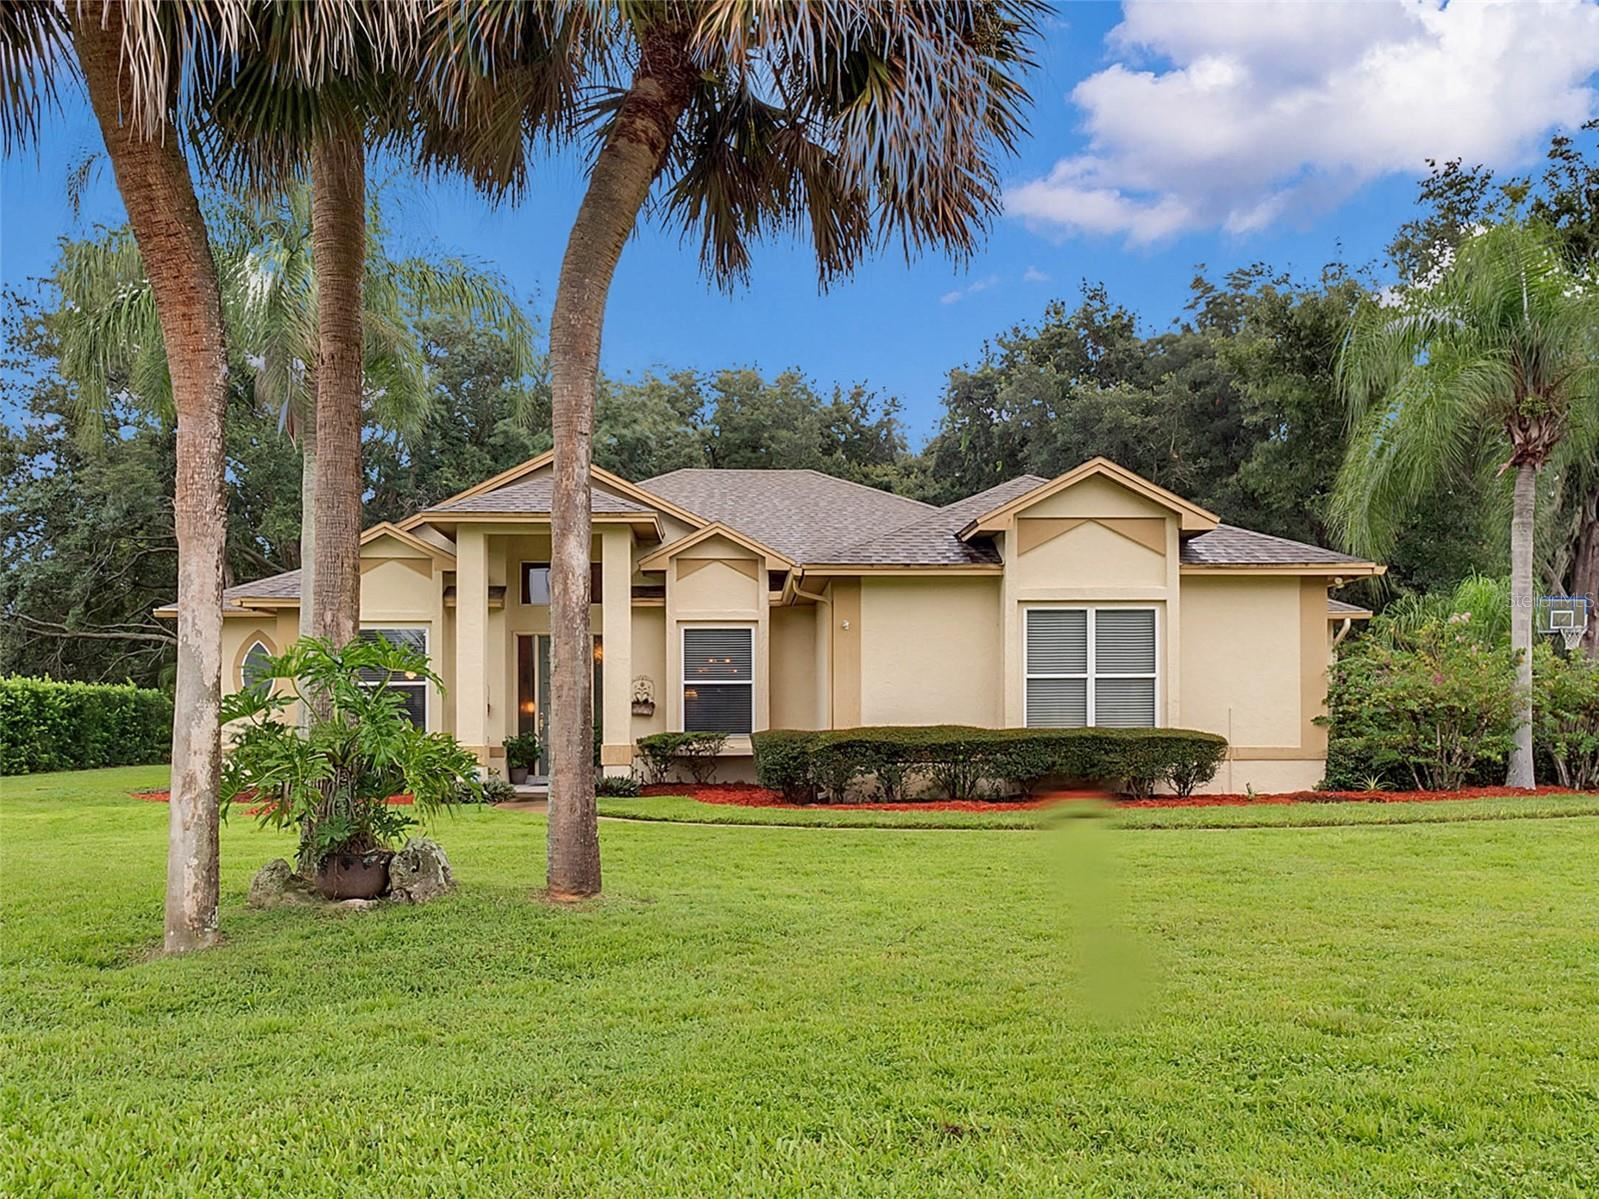 Photo of 5109 AUTUMN RIDGE LANE, WINDERMERE, FL 34786 (MLS # G5046451)